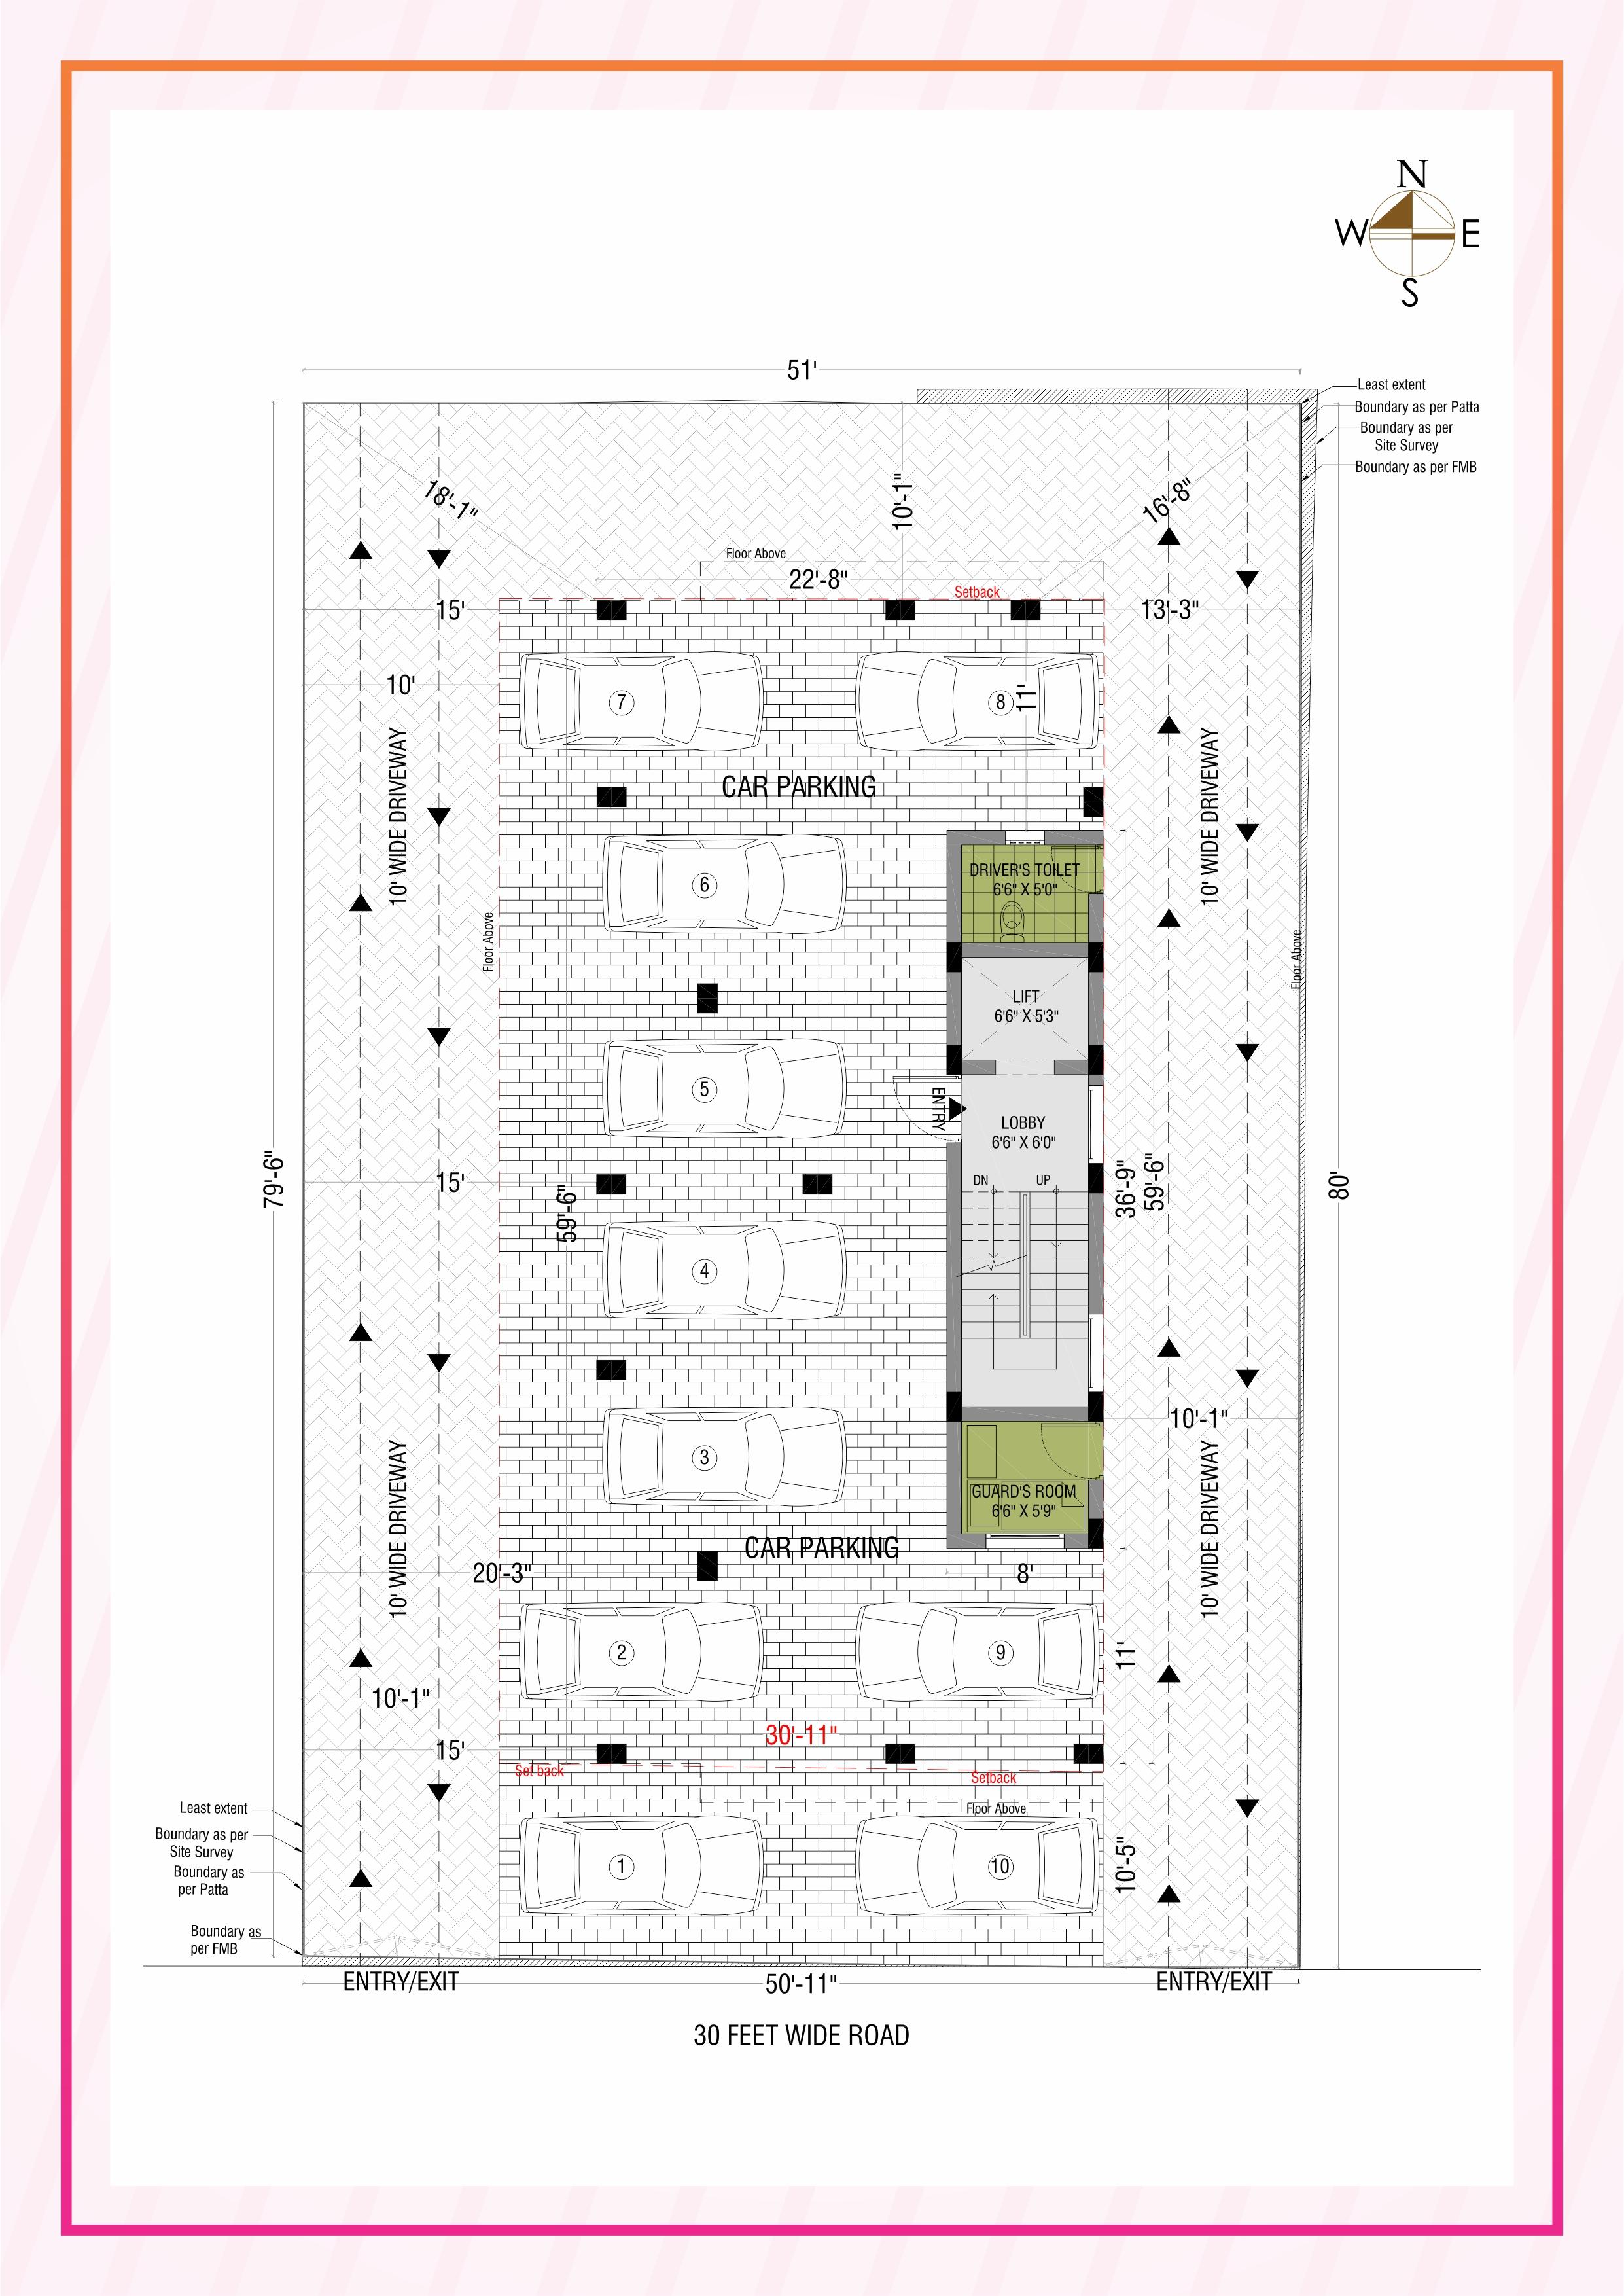 https://www.firmfoundations.in/projects/floorplans/thumbnails/15948114772CAR_PAR_Q_50.jpg